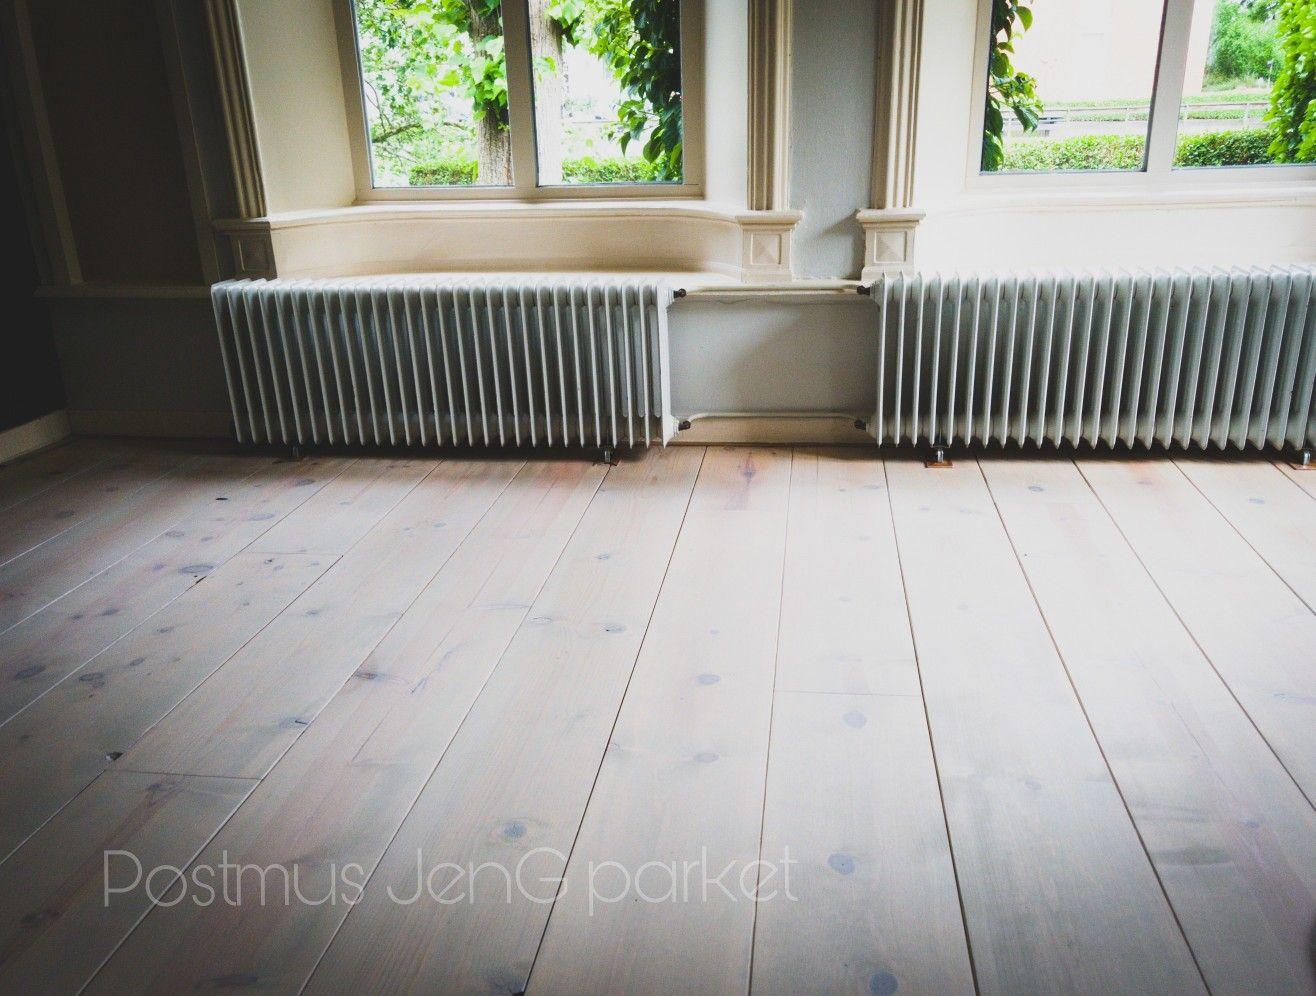 Houten vloer inspiratie oranje verkleurde grenen vloer omgetoverd